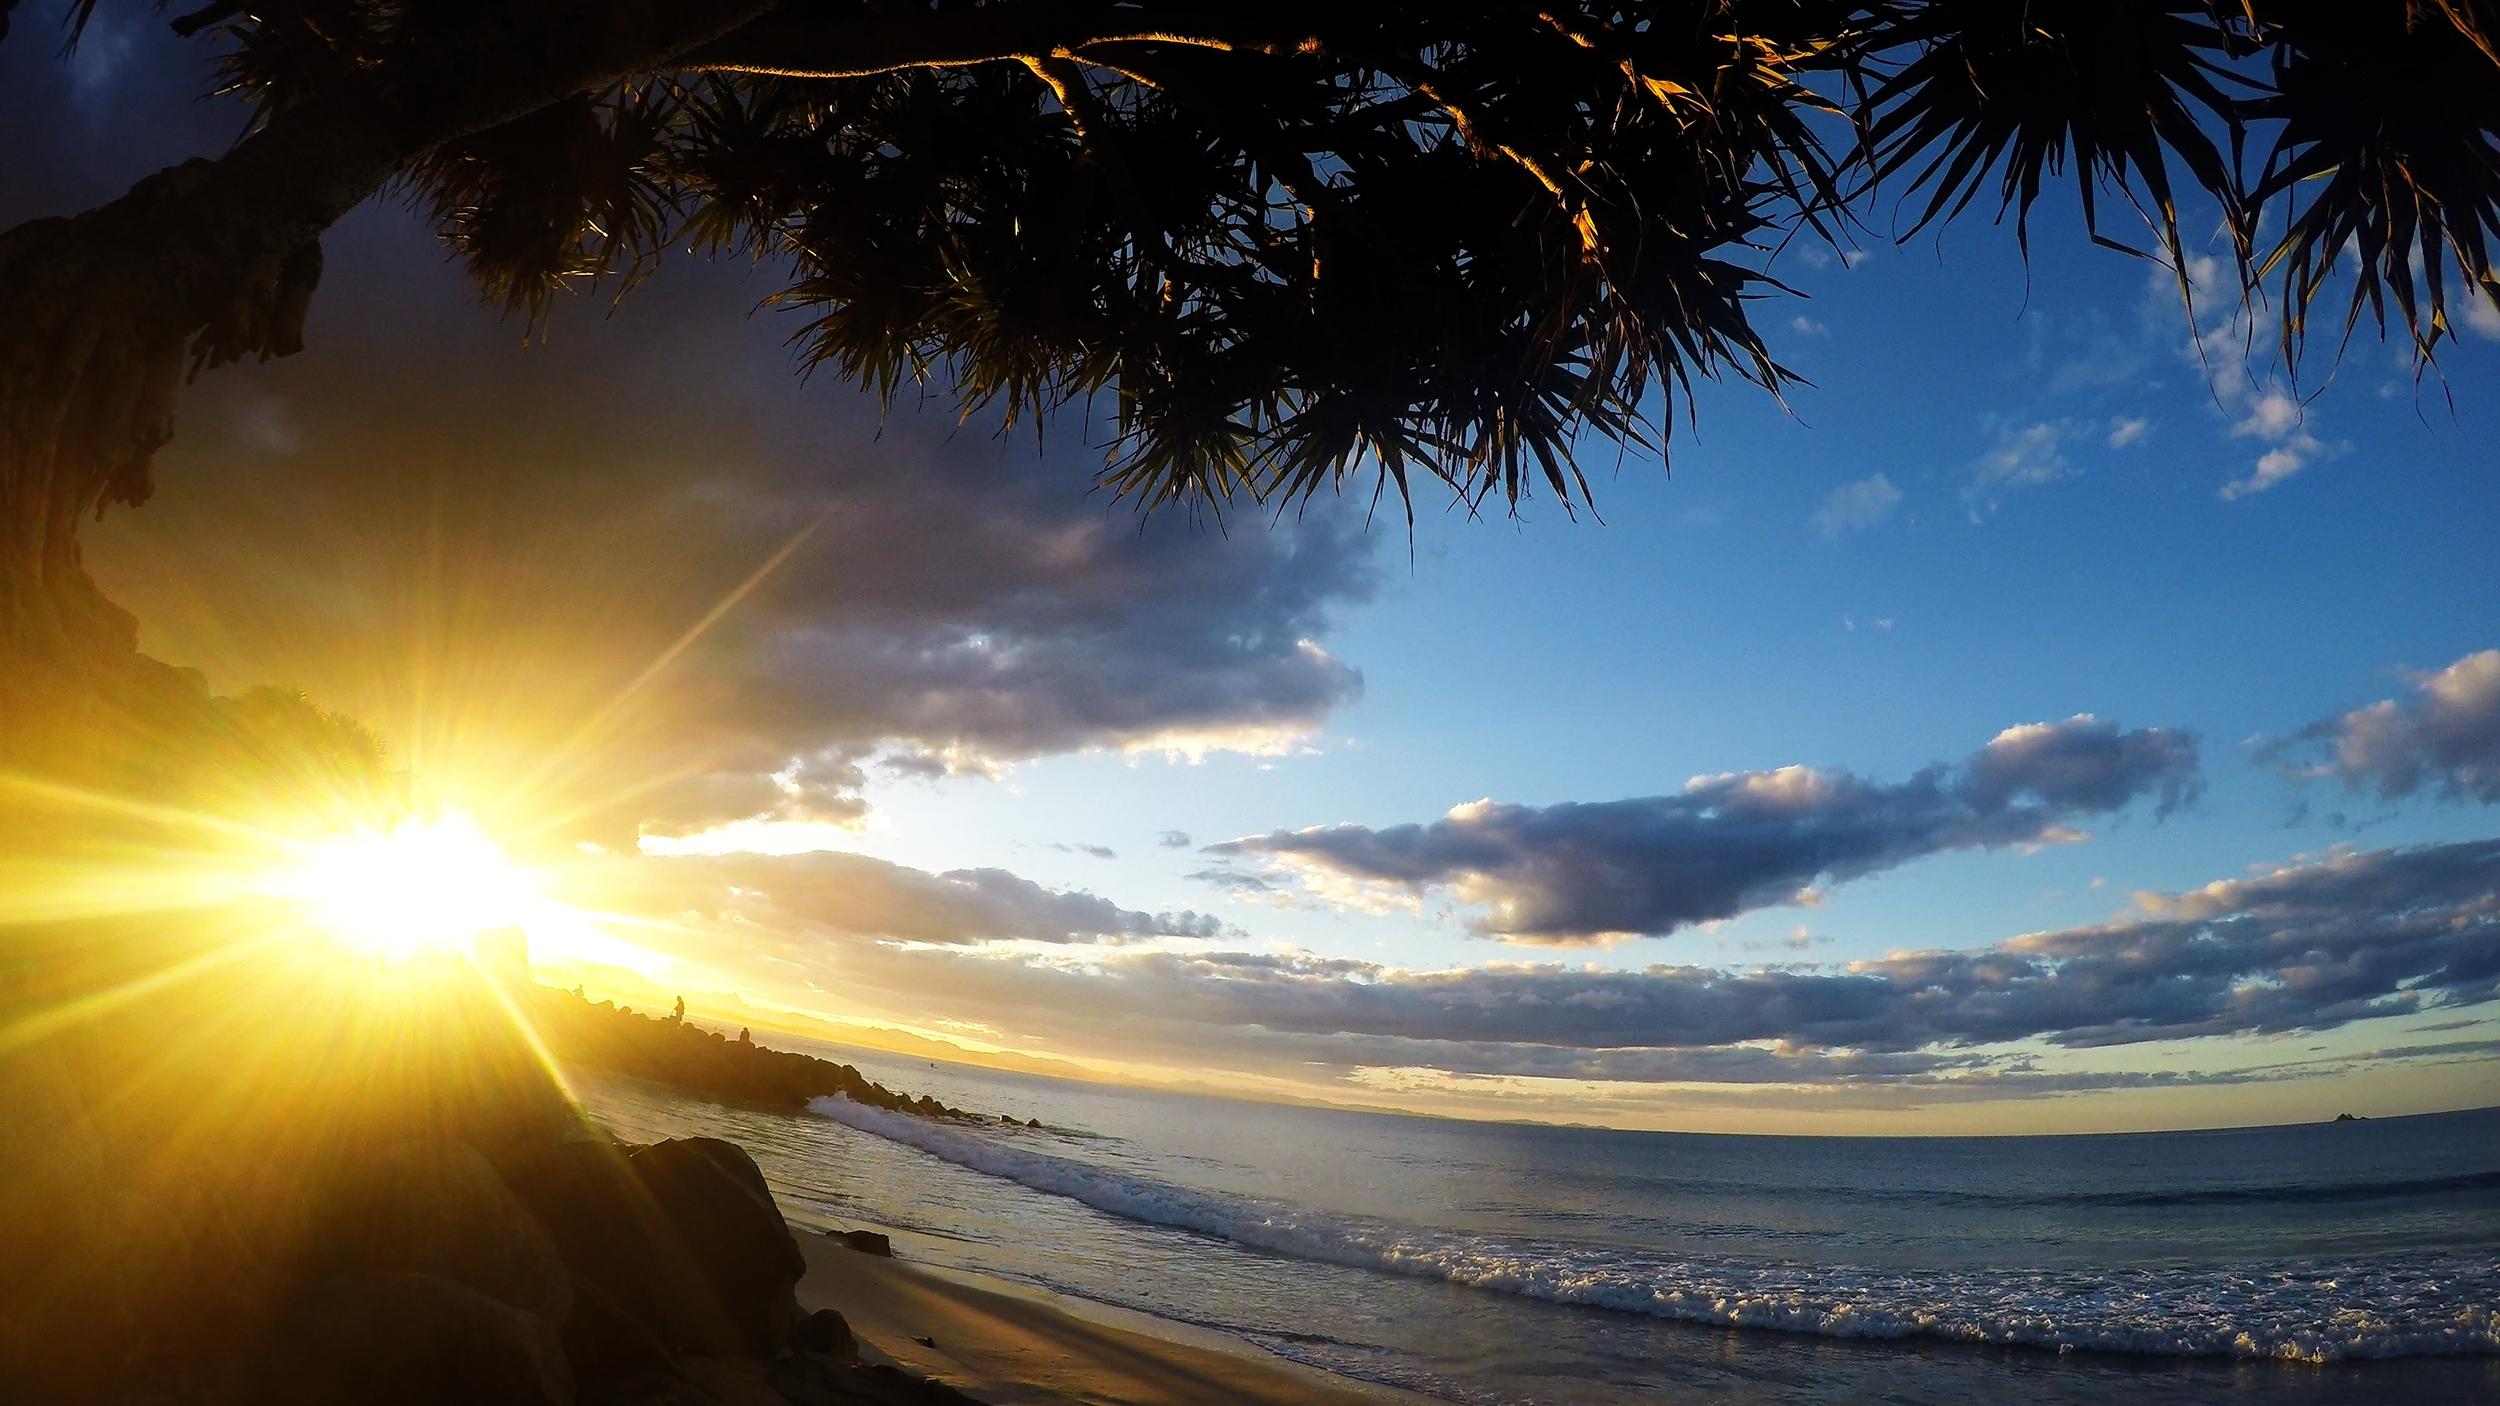 Sunset - Byron Bay, Australia